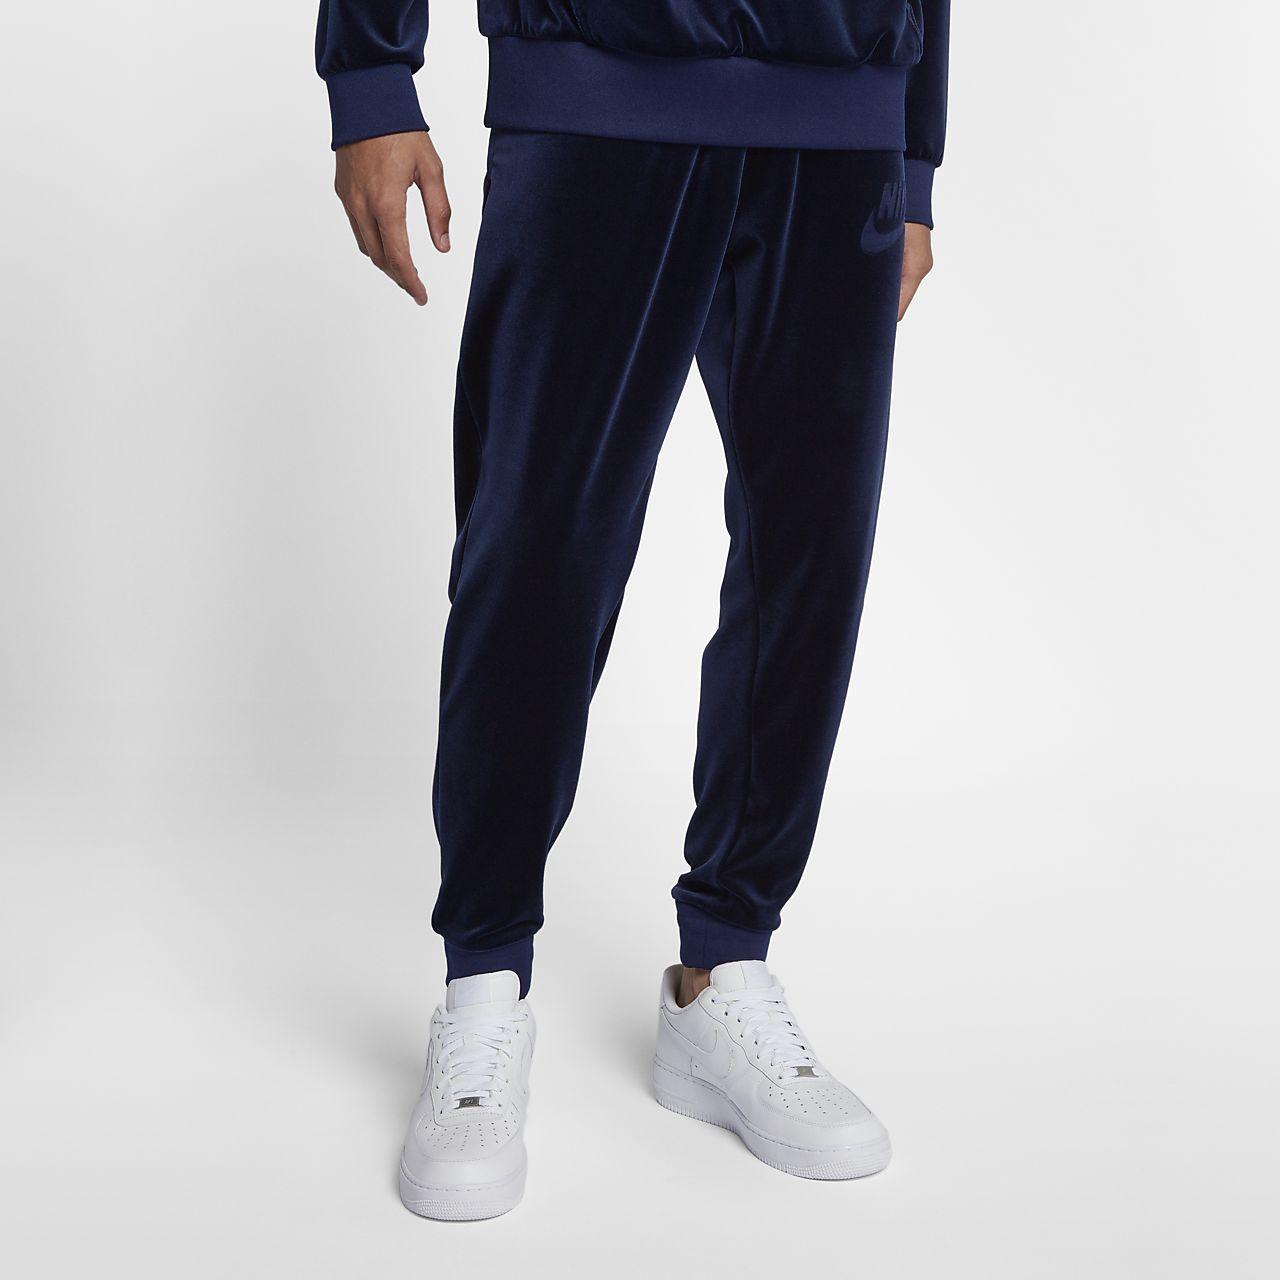 innovative design a9f91 e07a1 Nike Sportswear Men s Velour Trousers. Nike.com AU